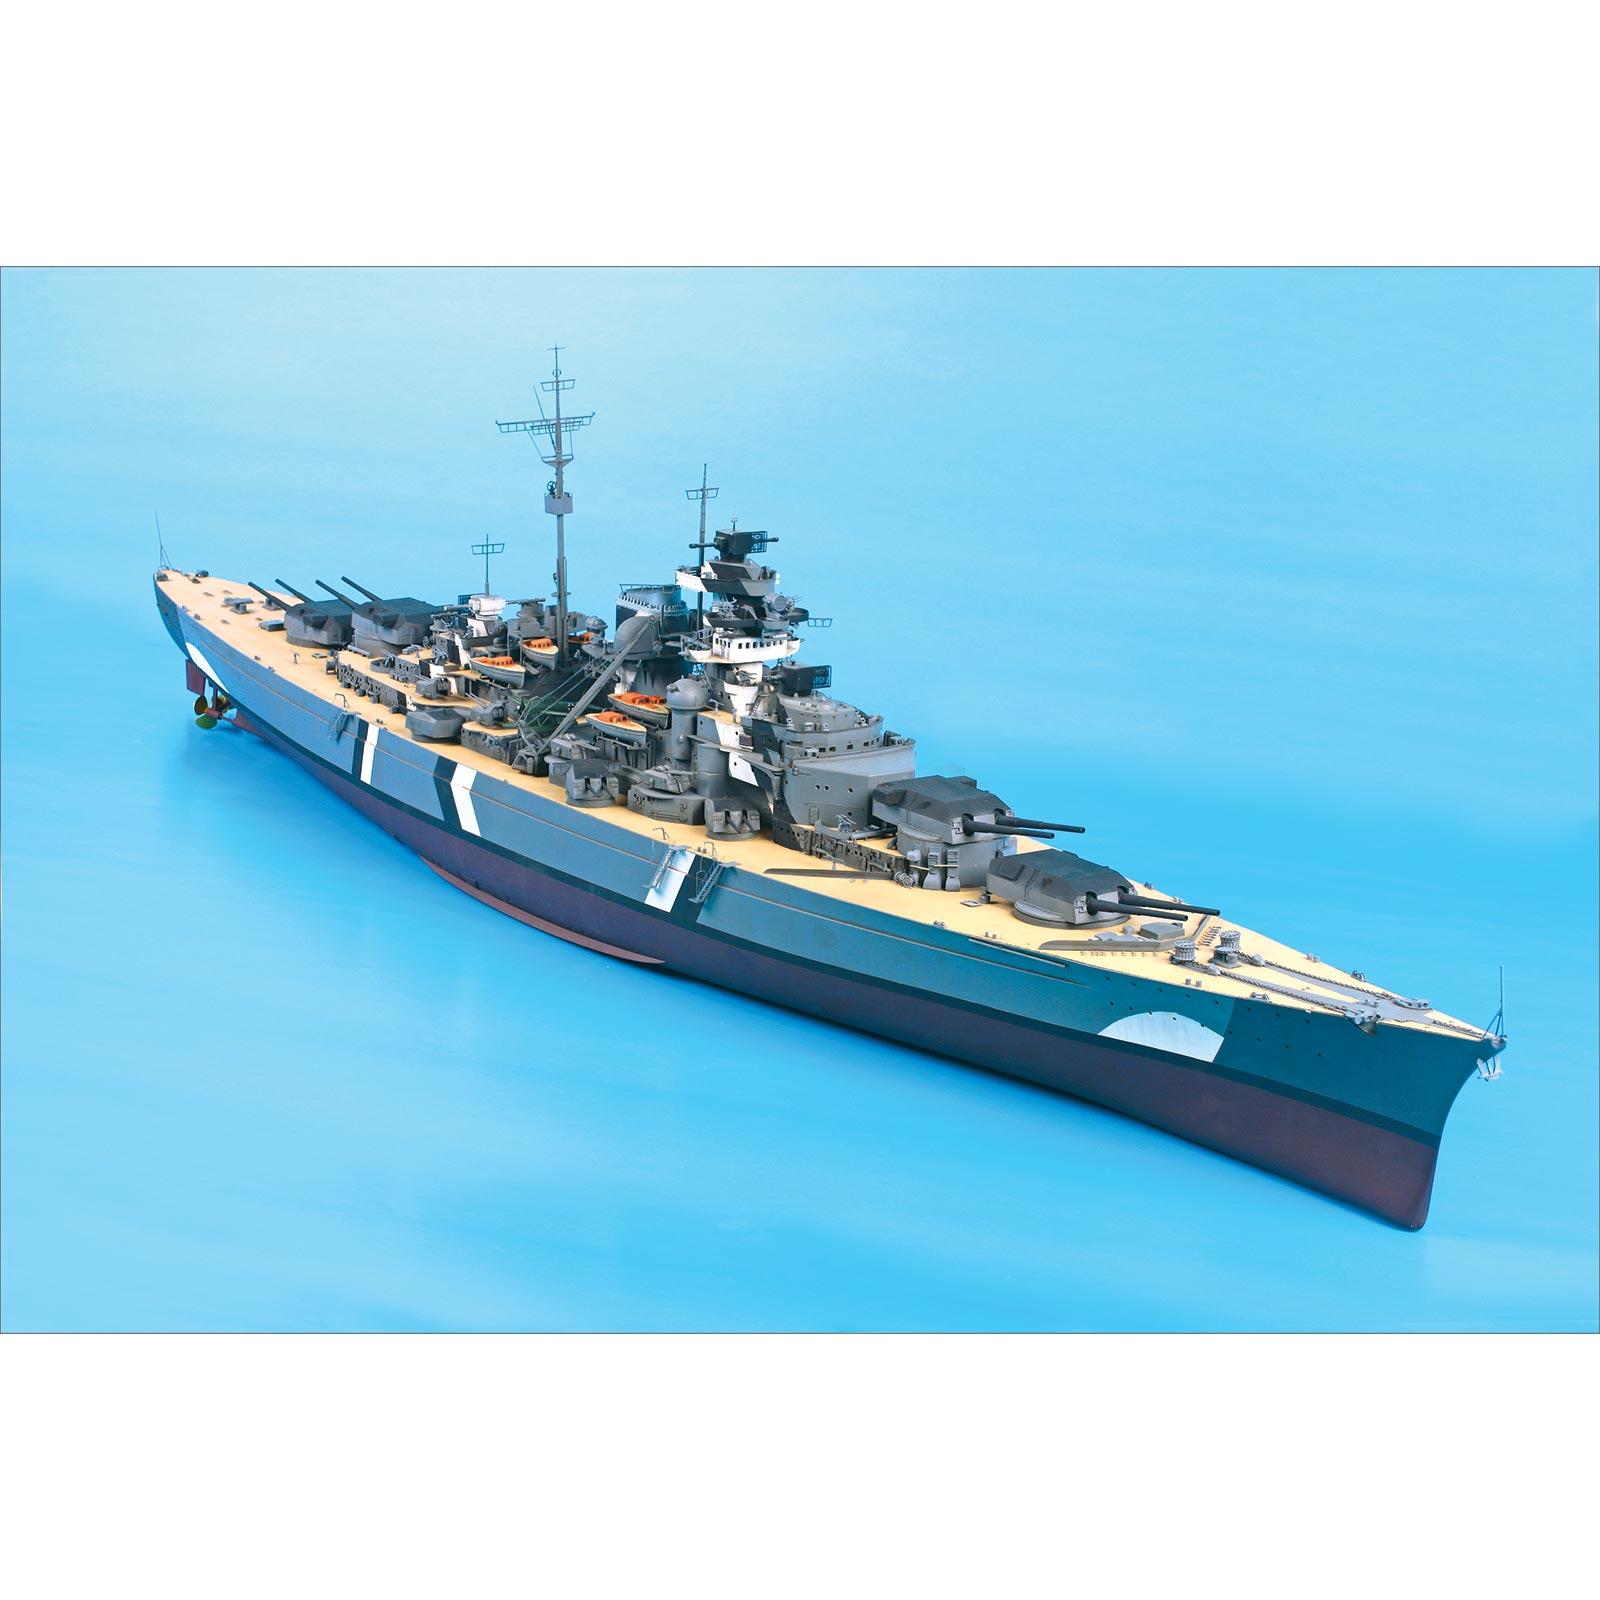 Battleship Bismarck Plastic Model Kit 1 200 Scale